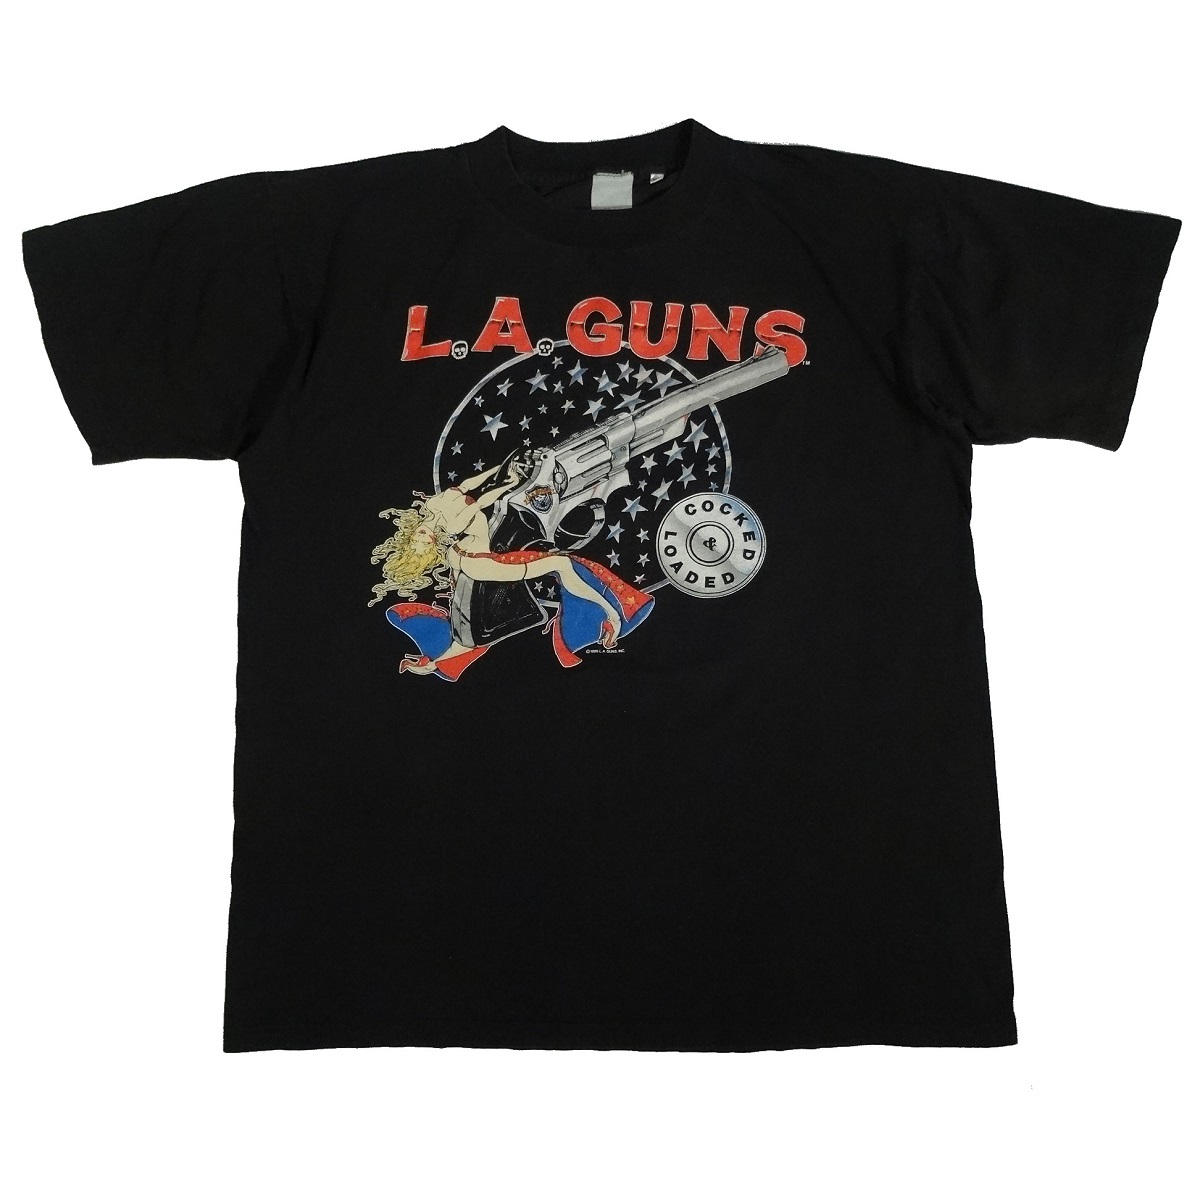 la guns cocked & loaded 1989 vintage 80s t shirt front of shirt